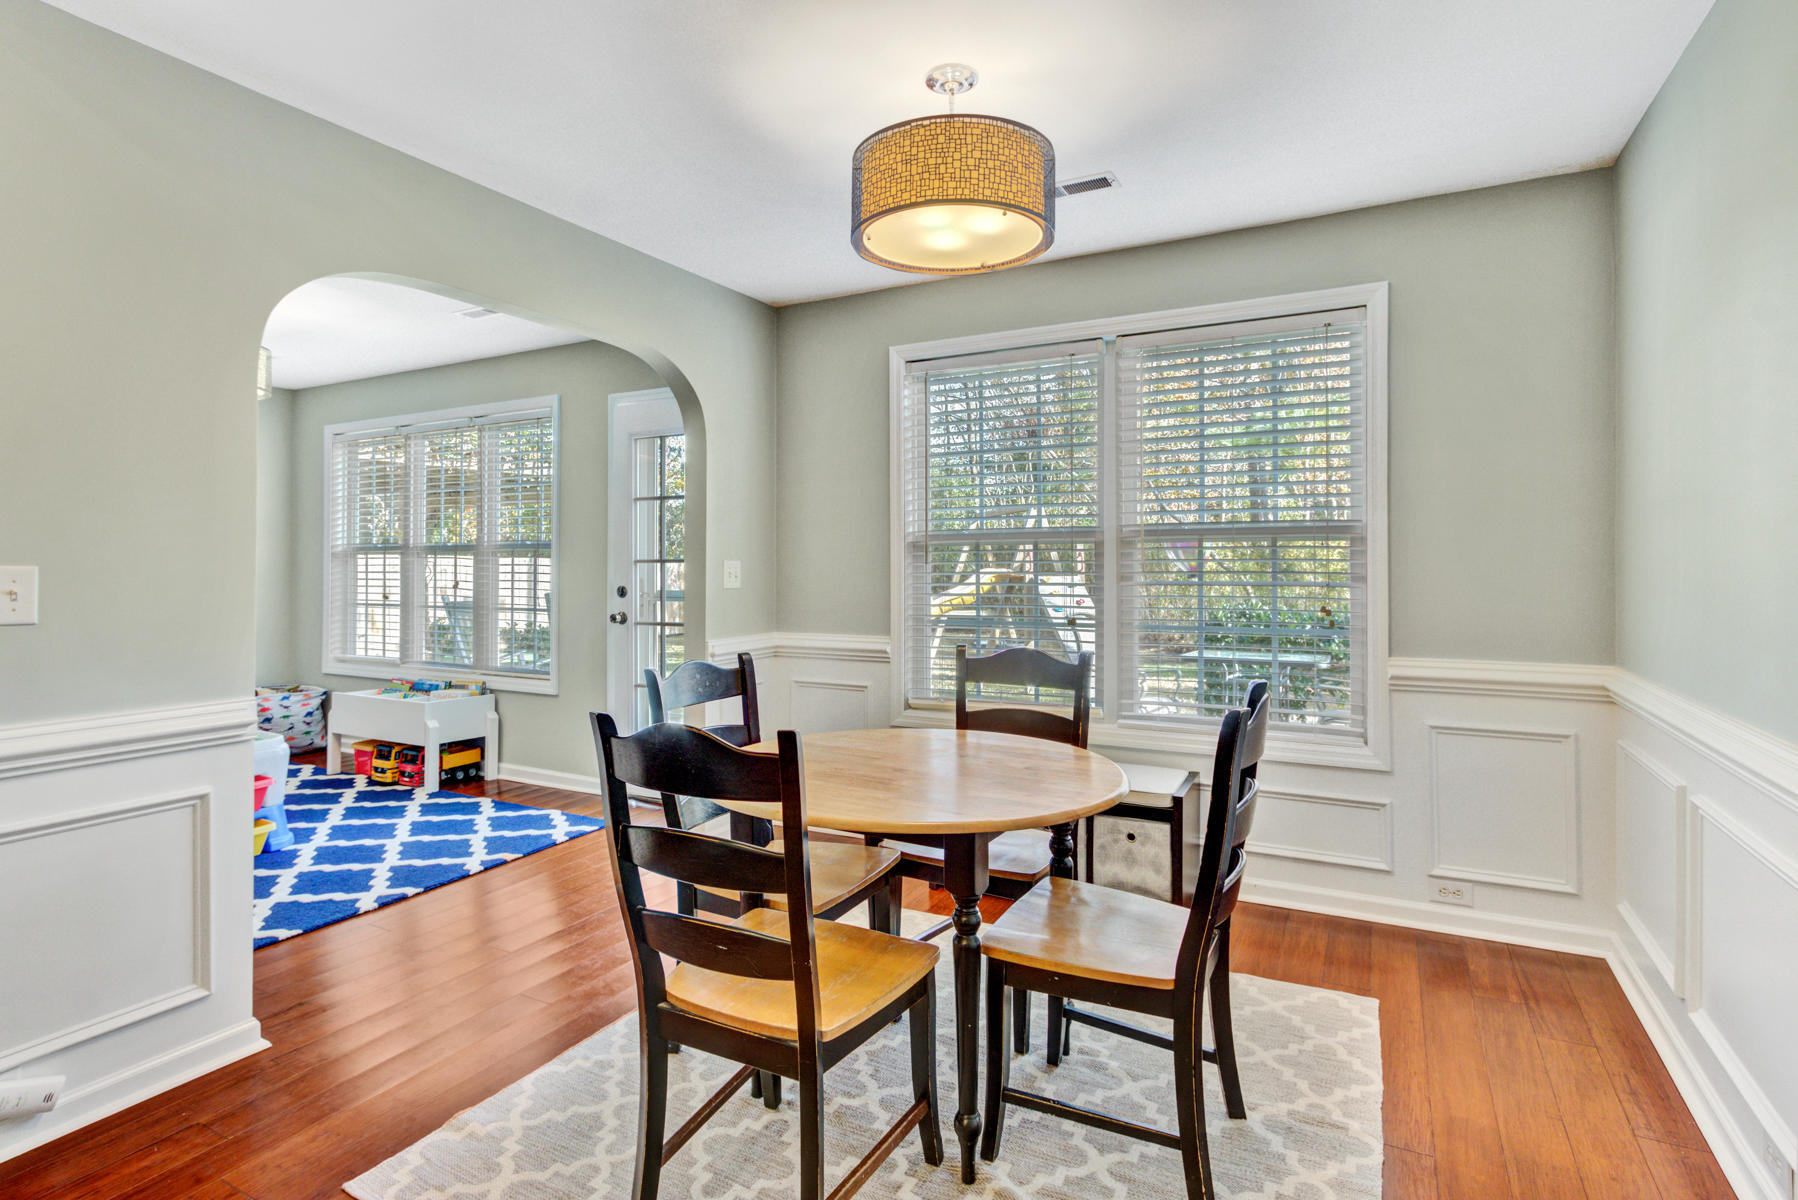 Park West Homes For Sale - 3444 Wellesley, Mount Pleasant, SC - 16